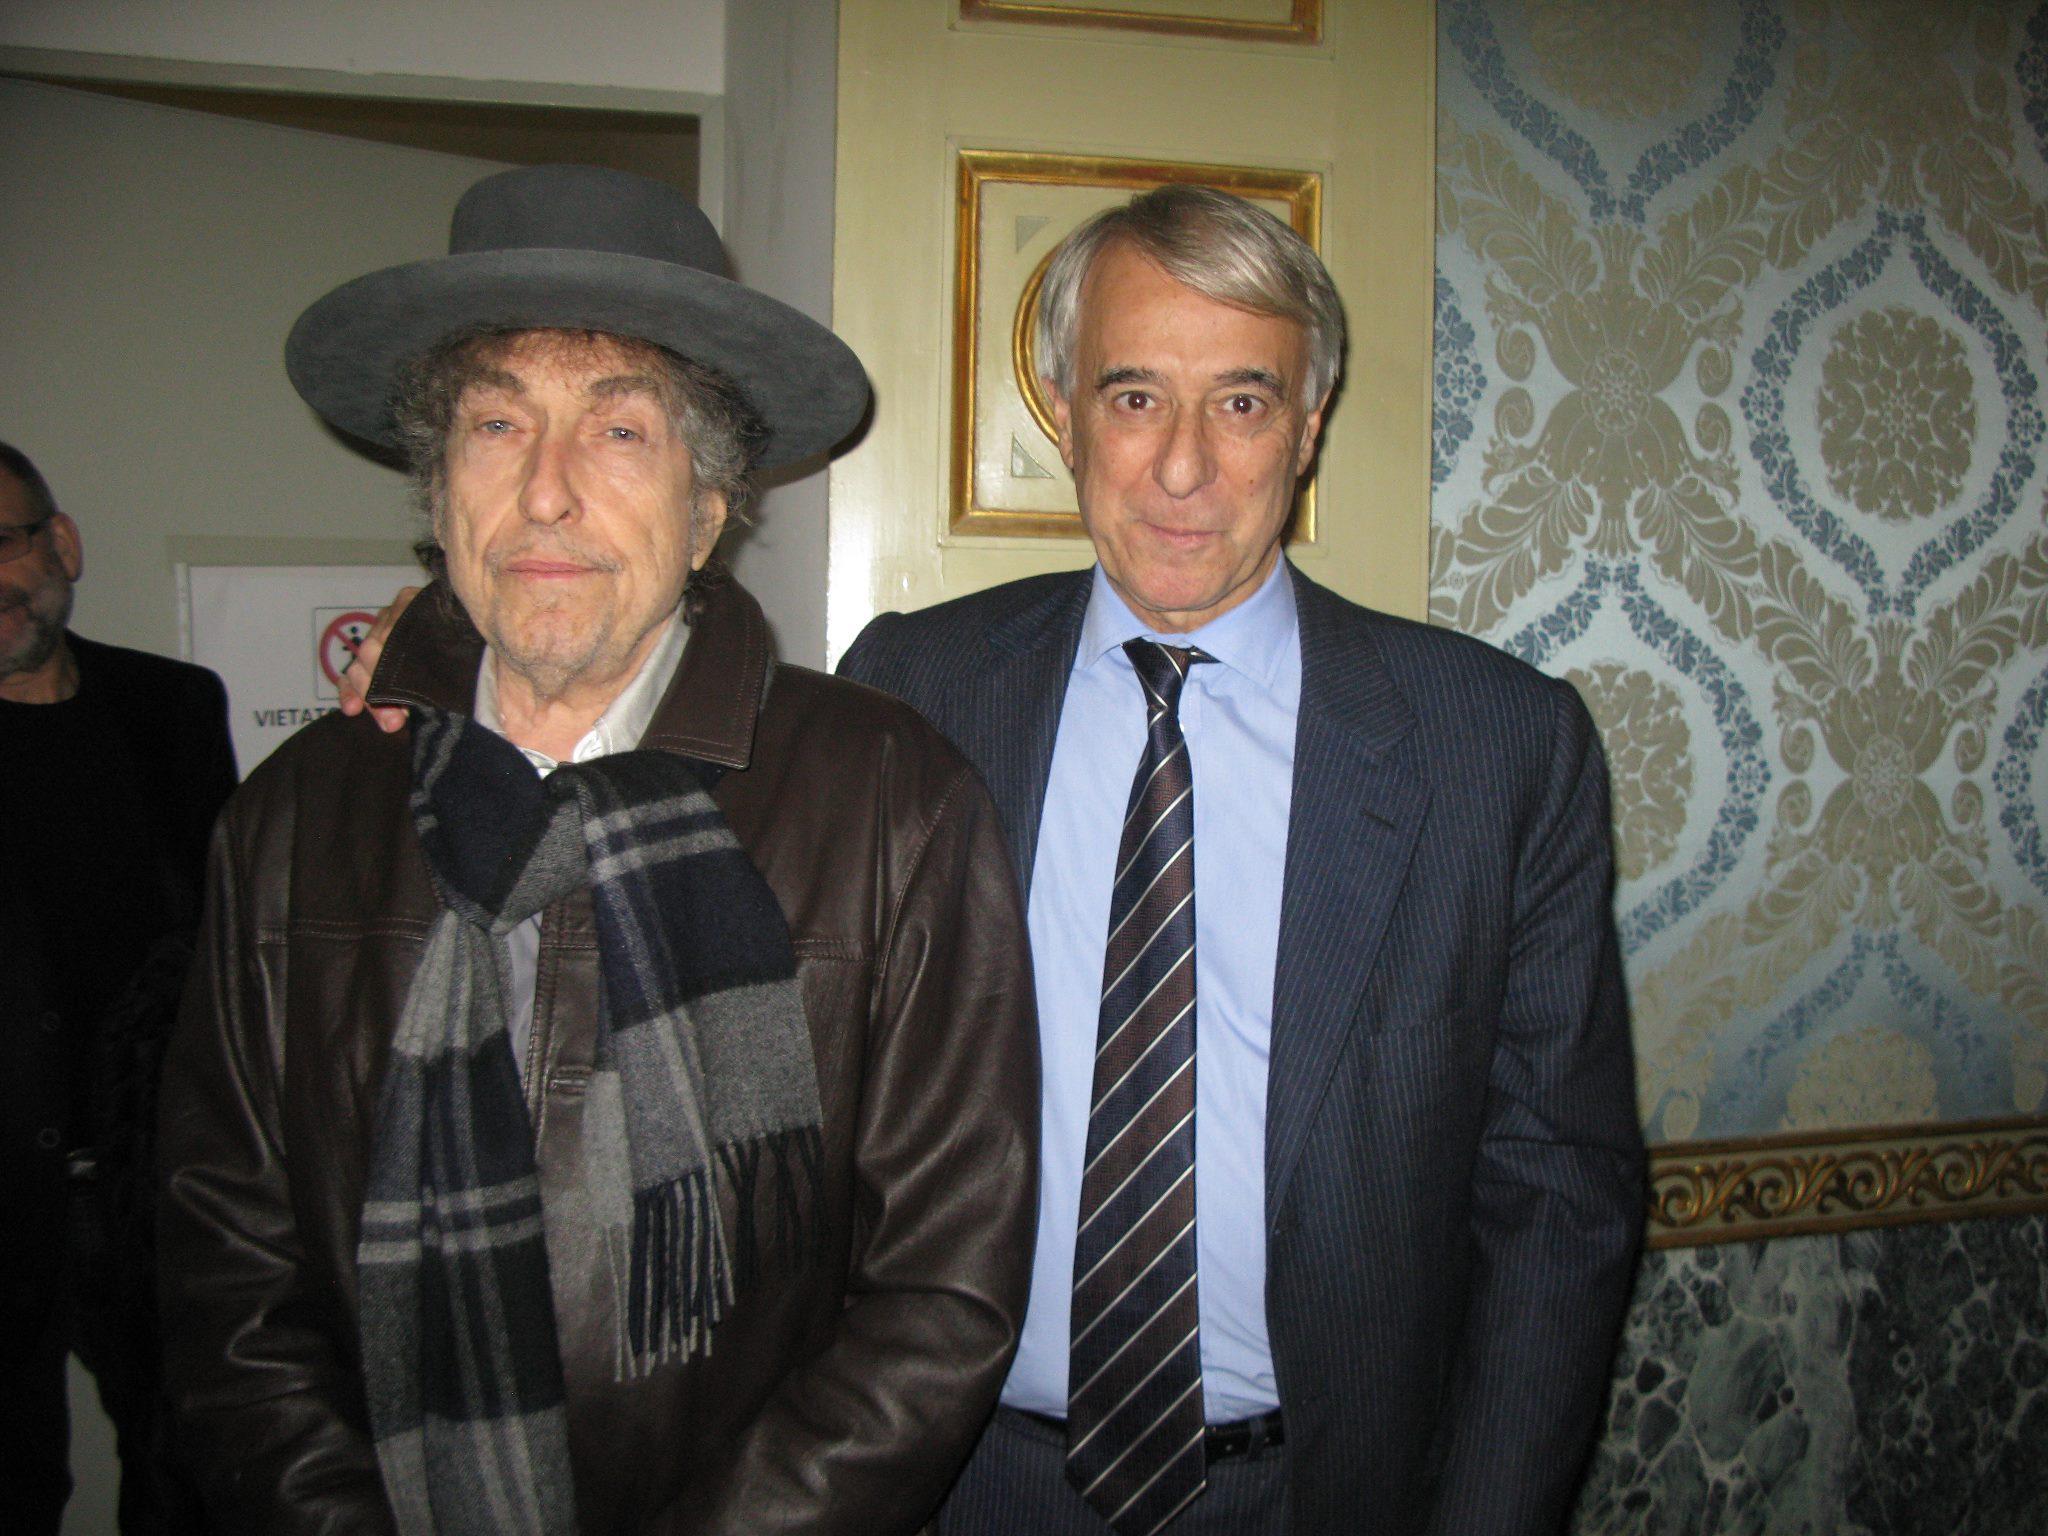 Bob_with_mayor_of_Milano.jpg